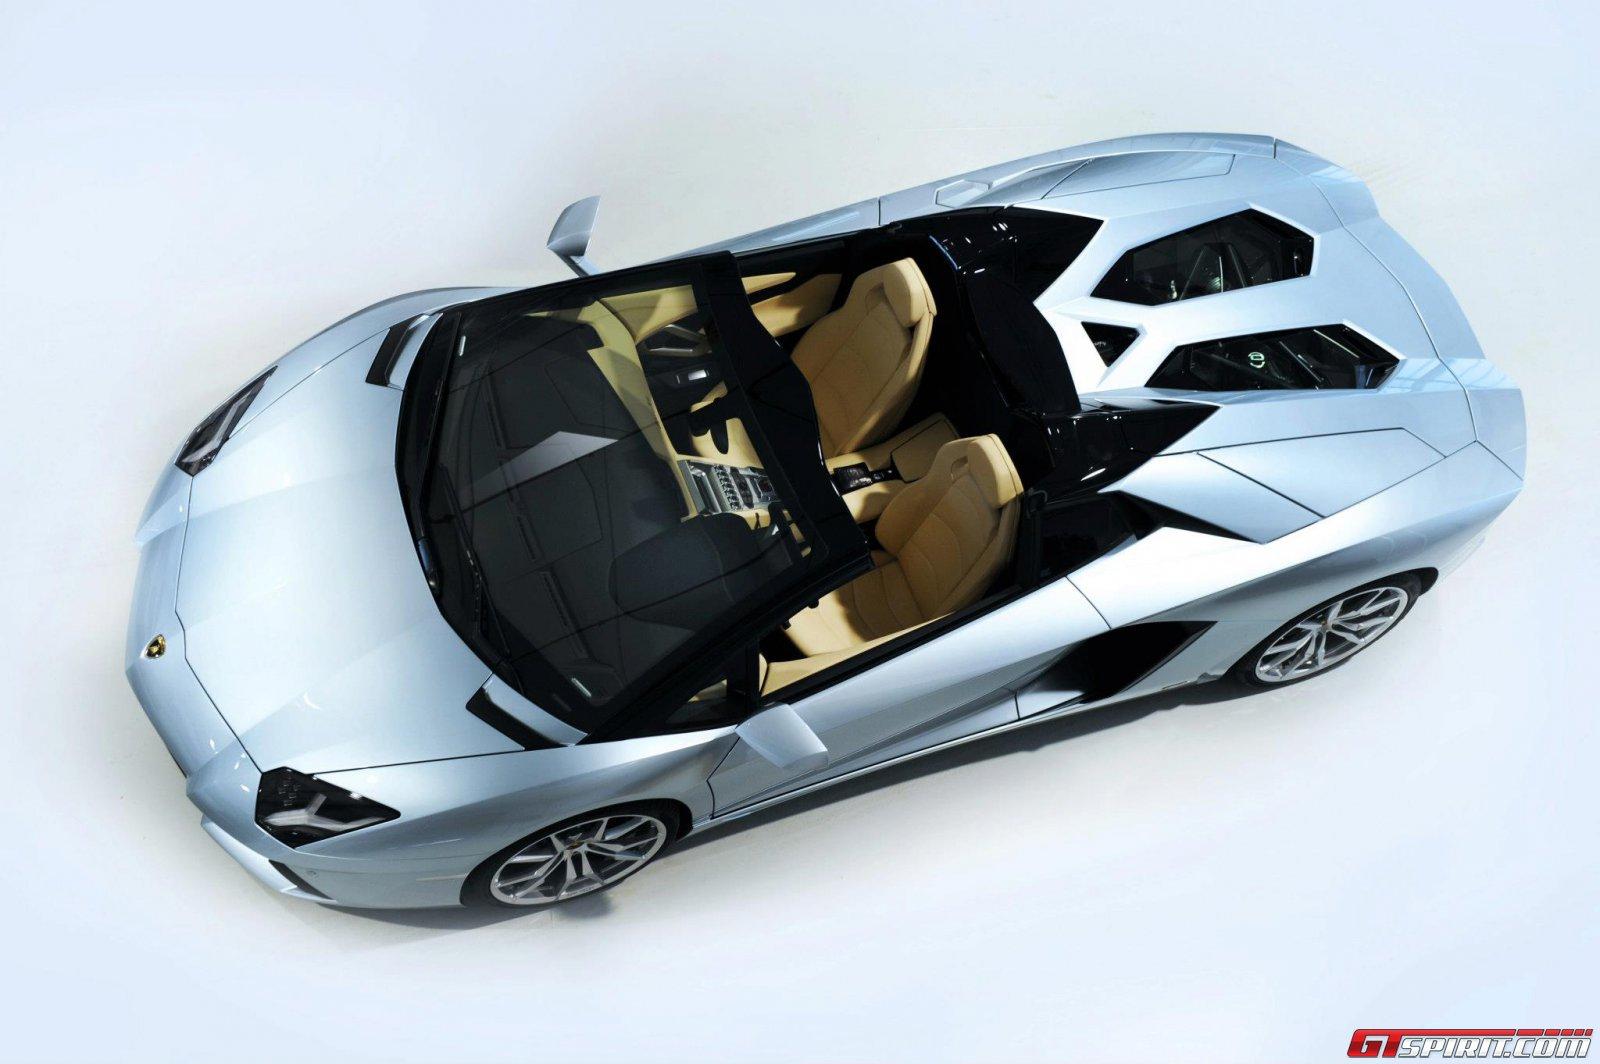 2013 Lamborghini Aventador LP700-4 Roadster Photo 22